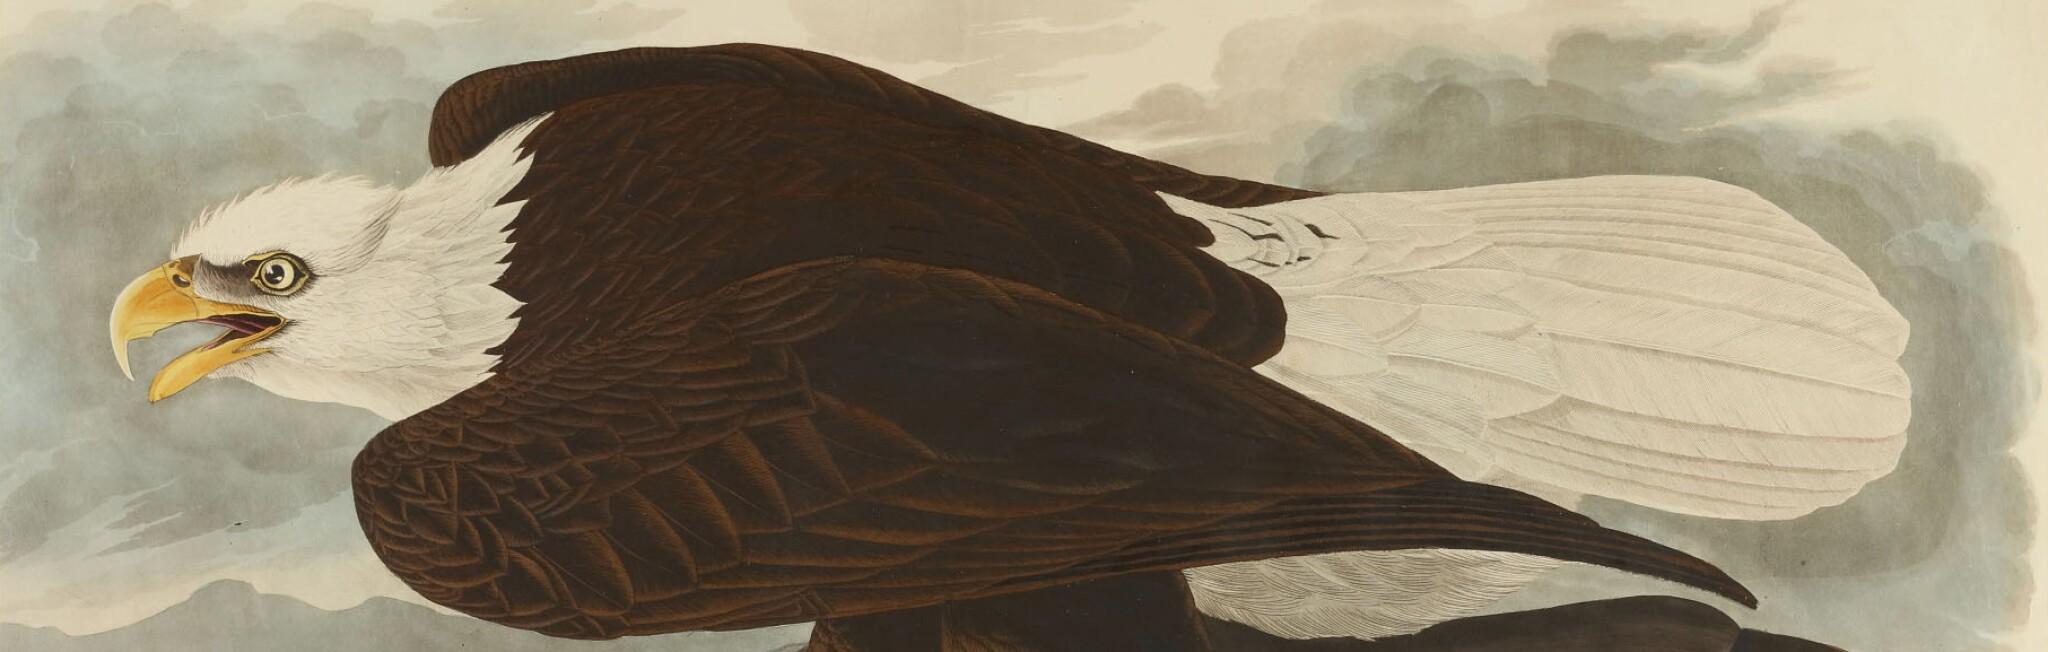 The Birds of America from Original Drawings by John James Audubon